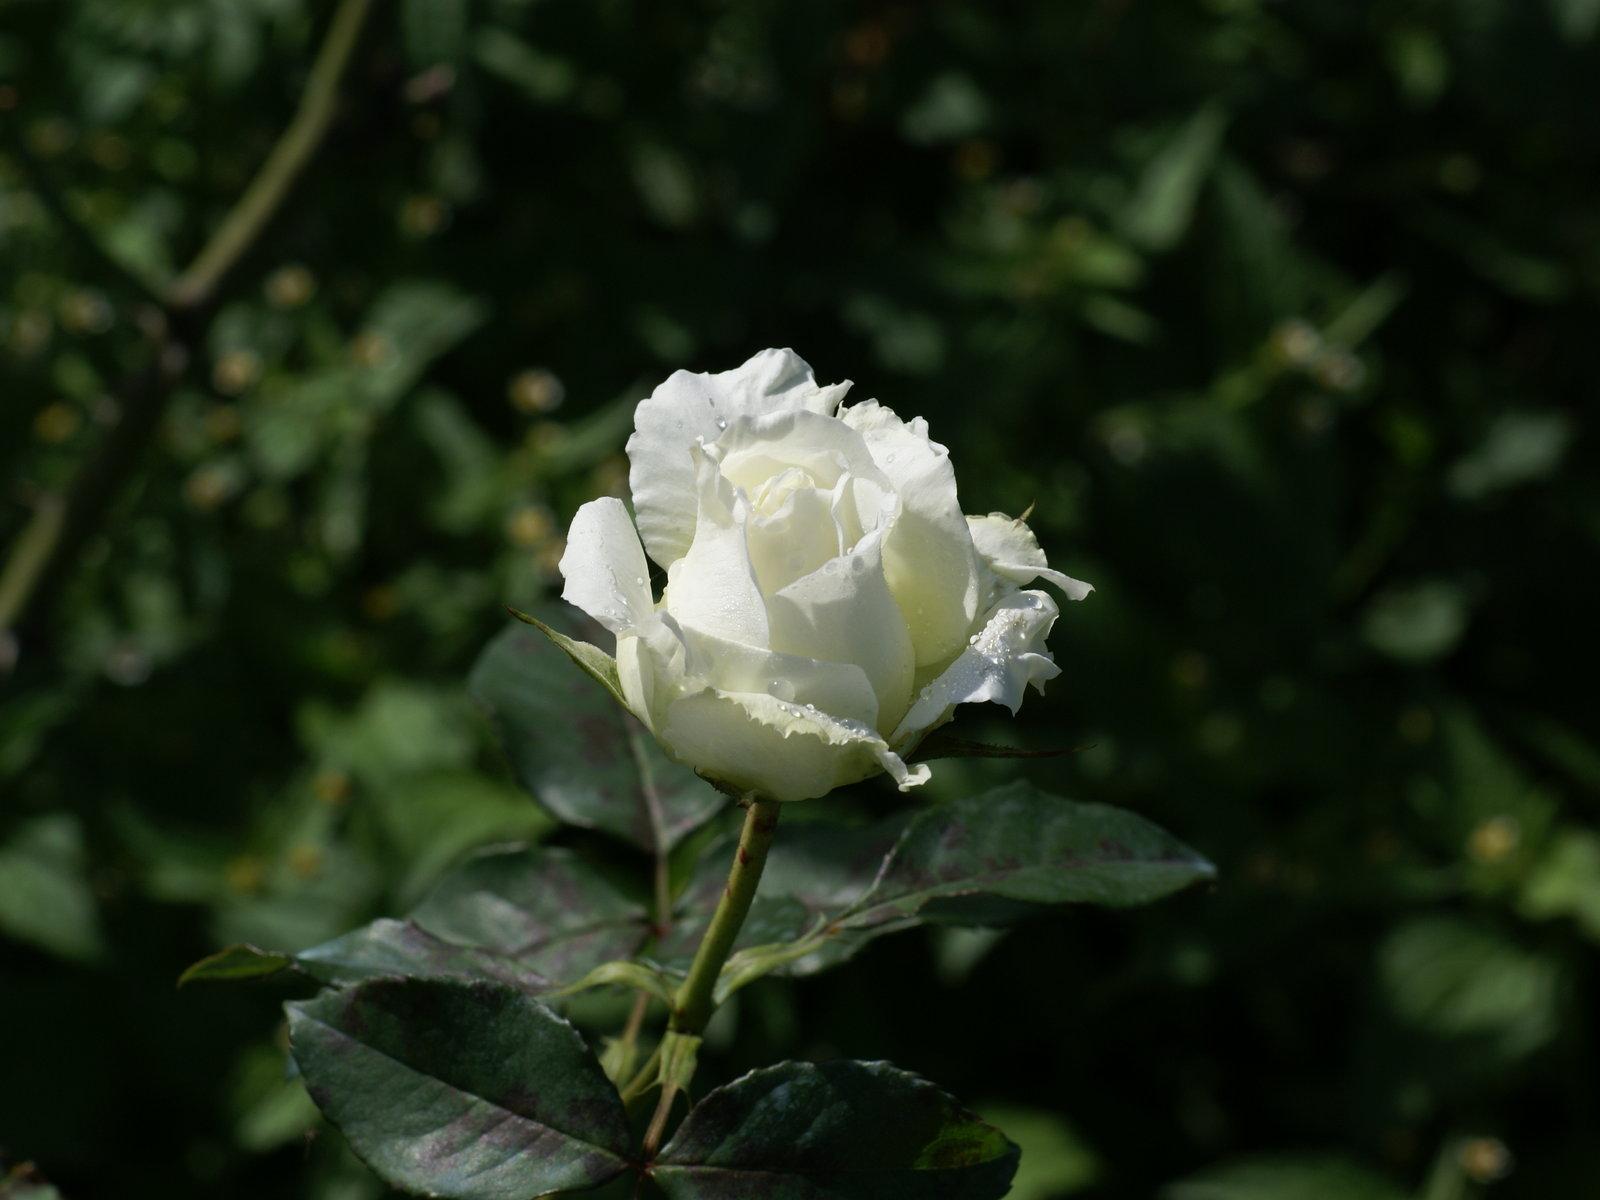 Imagenes de Rosas - Imagenes de Rosas